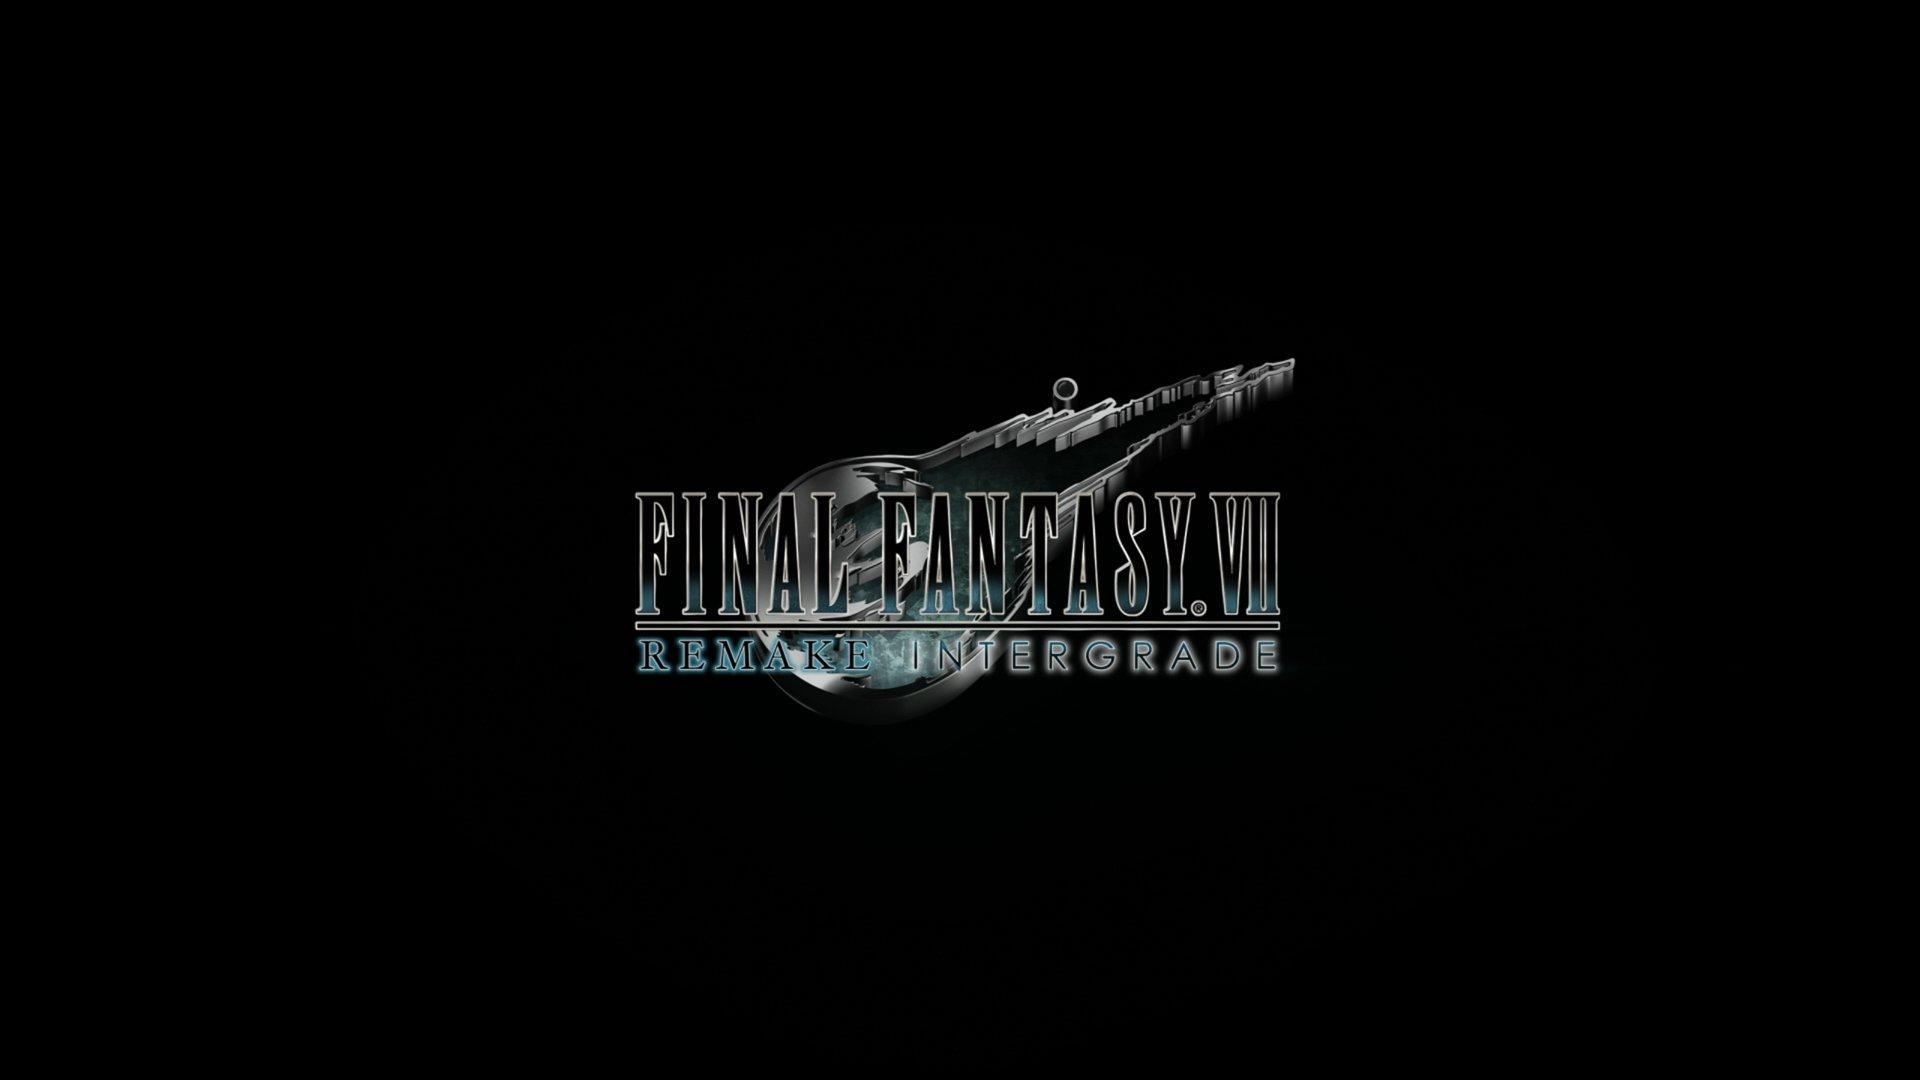 Final Fantasy VII Remake Intergrade - PS5 - Wallpapers